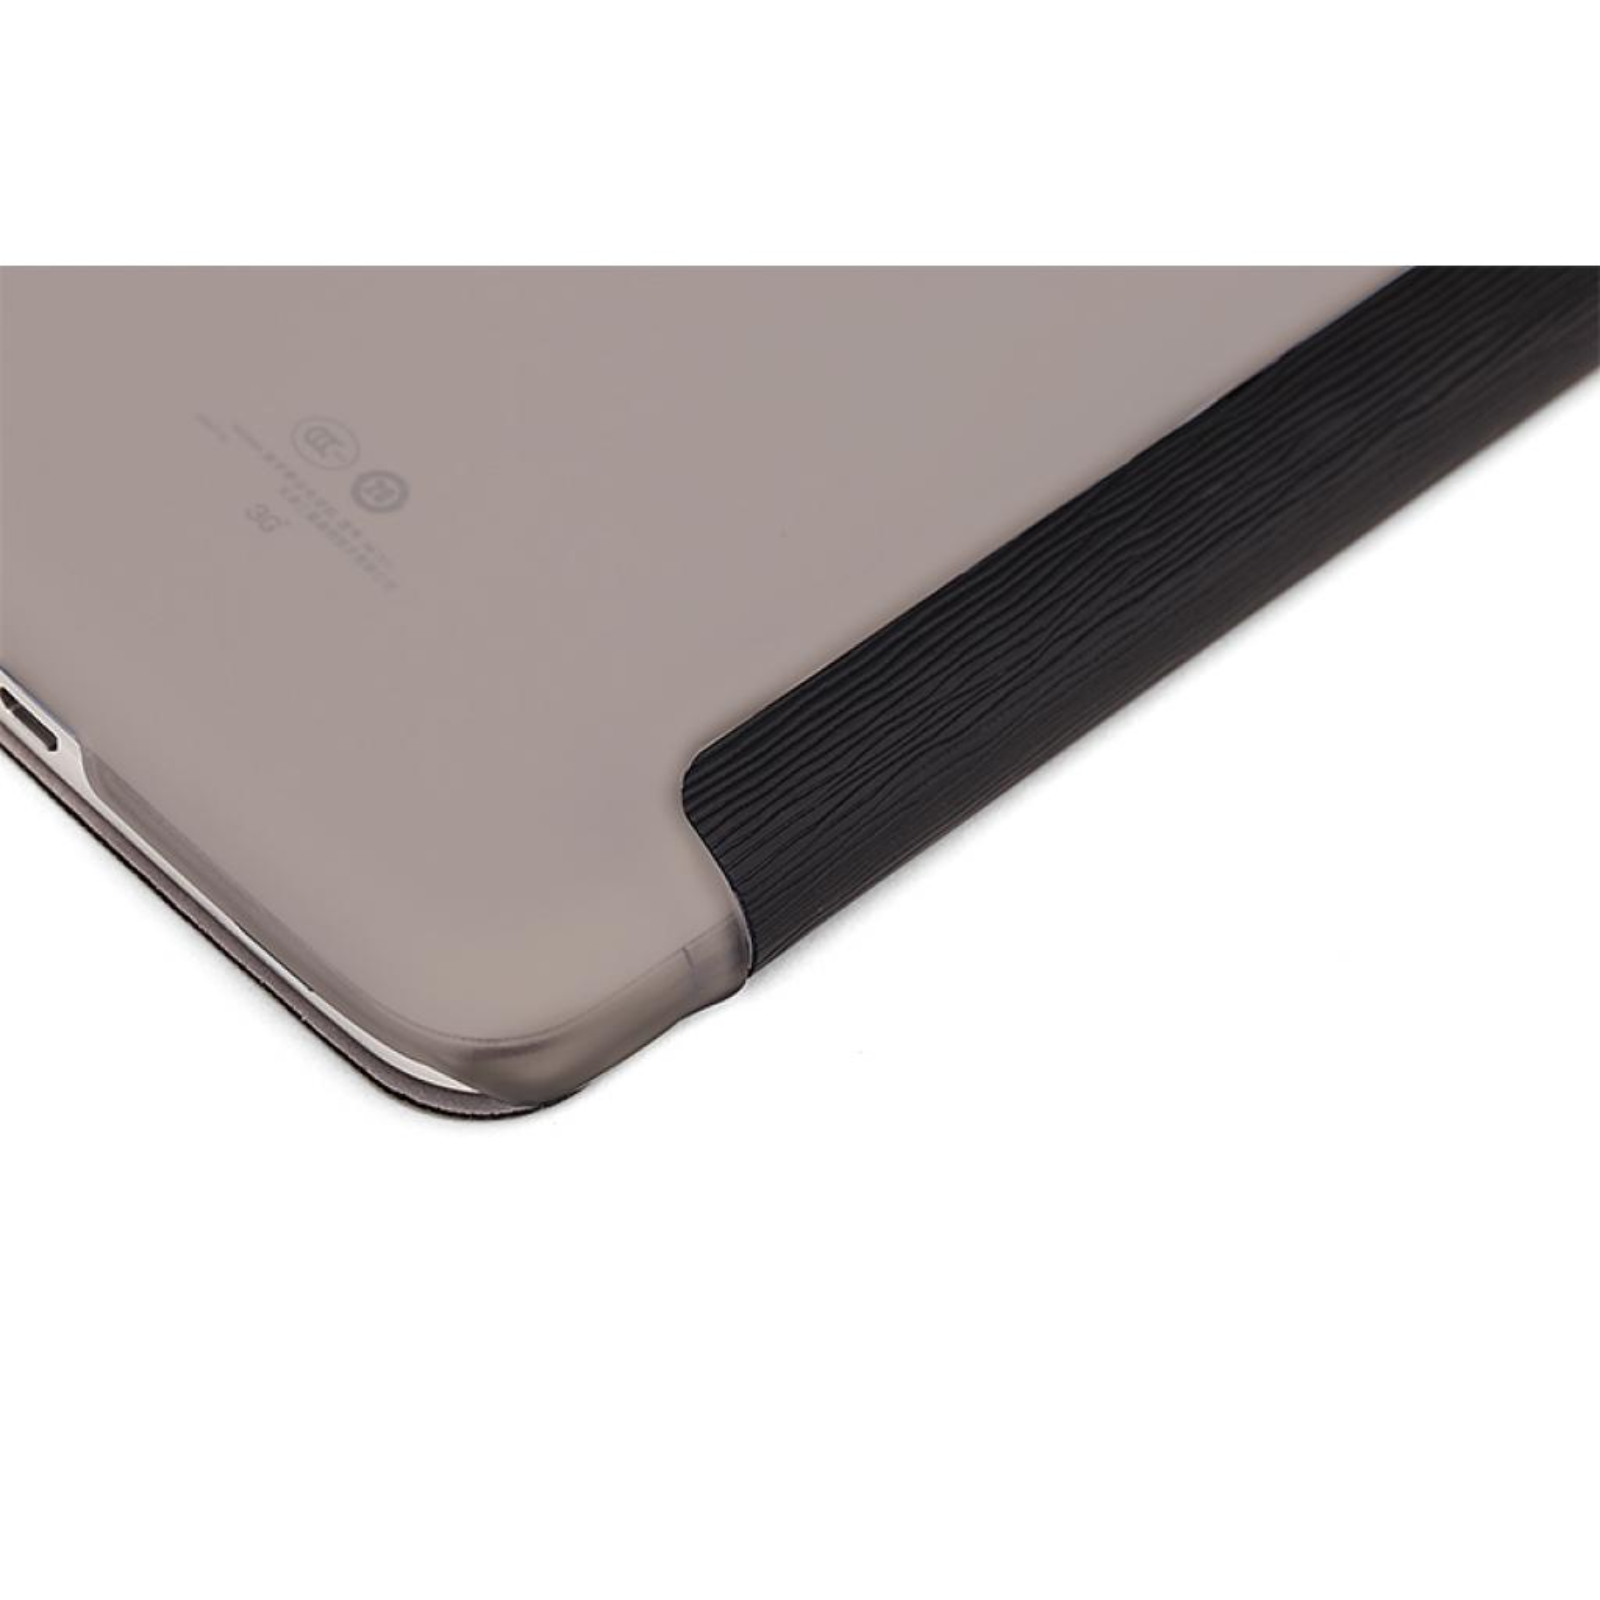 "Чехол для планшета Rock 7"" Samsung Galaxy Tab 3 7.0 T2100/T2110 Elegant Series (31849 black) изображение 5"